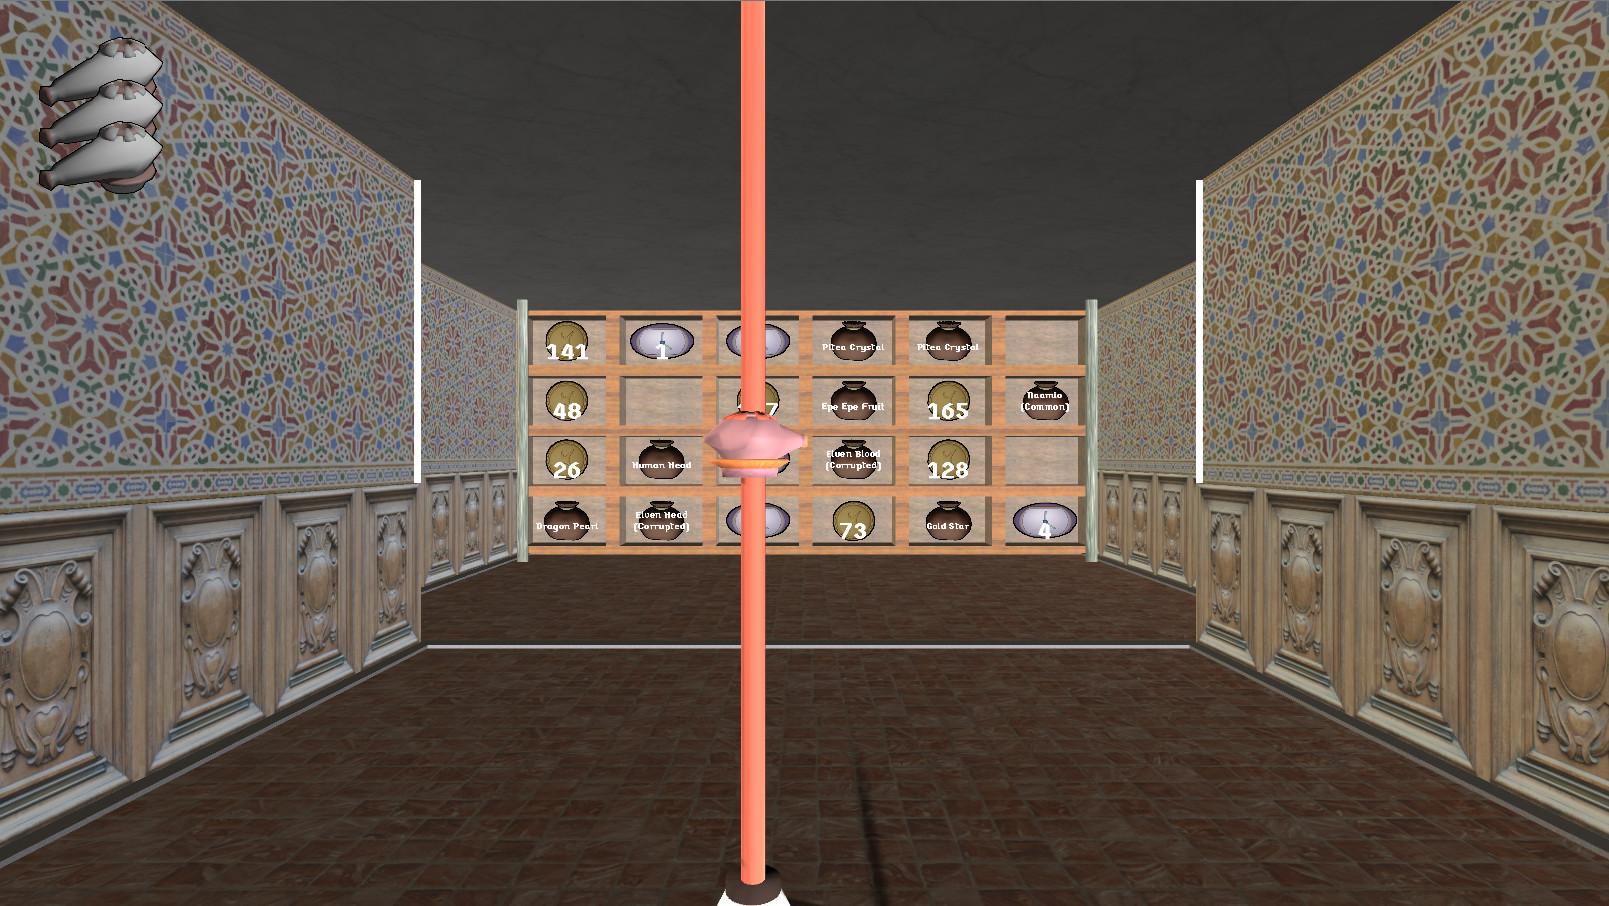 Mariuccha Alchemy Queen screenshot